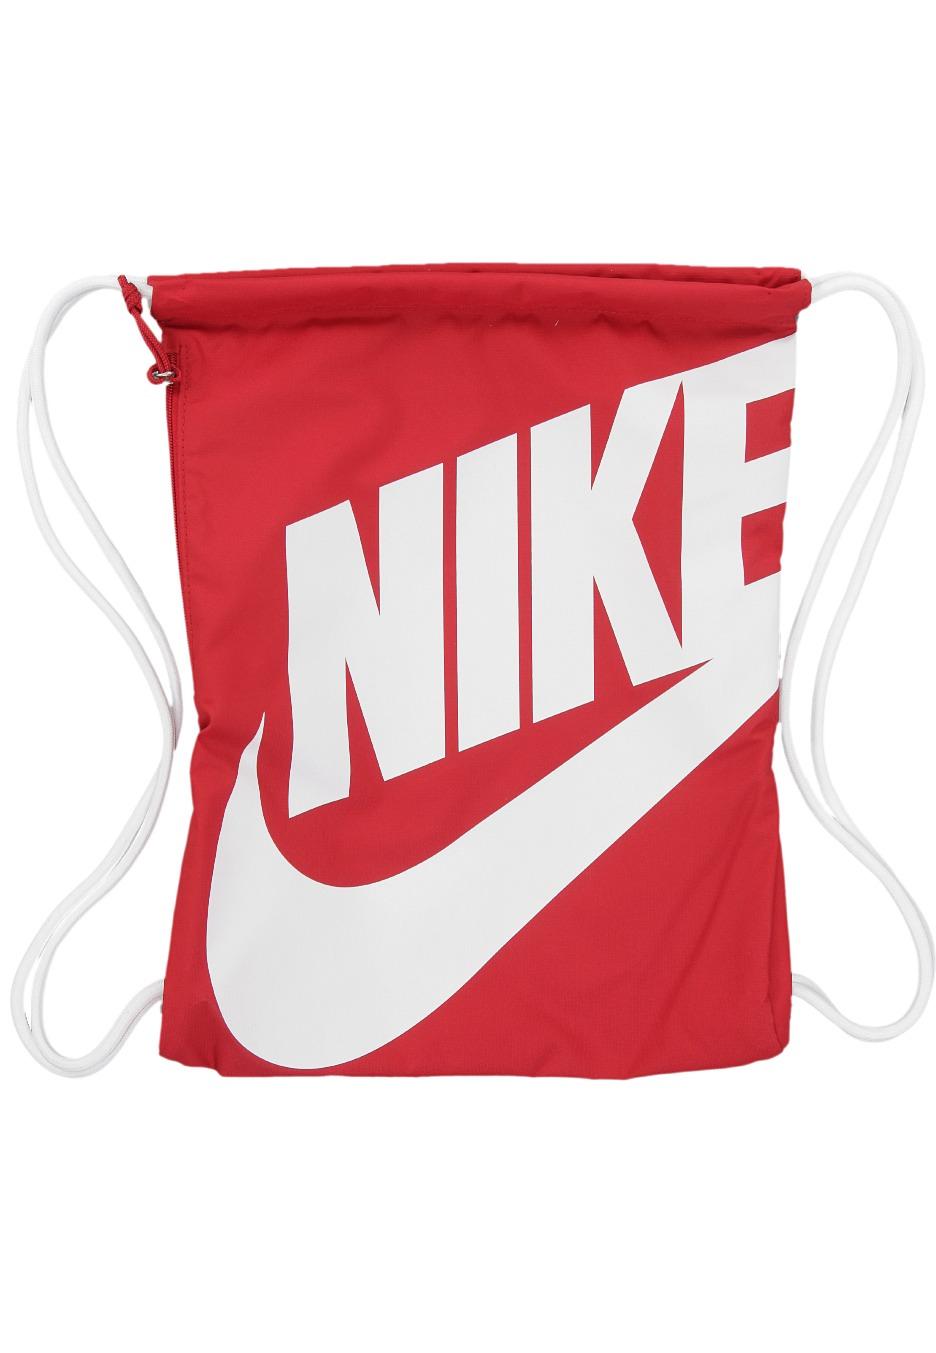 nike heritage gymsack gym red white white backpack. Black Bedroom Furniture Sets. Home Design Ideas